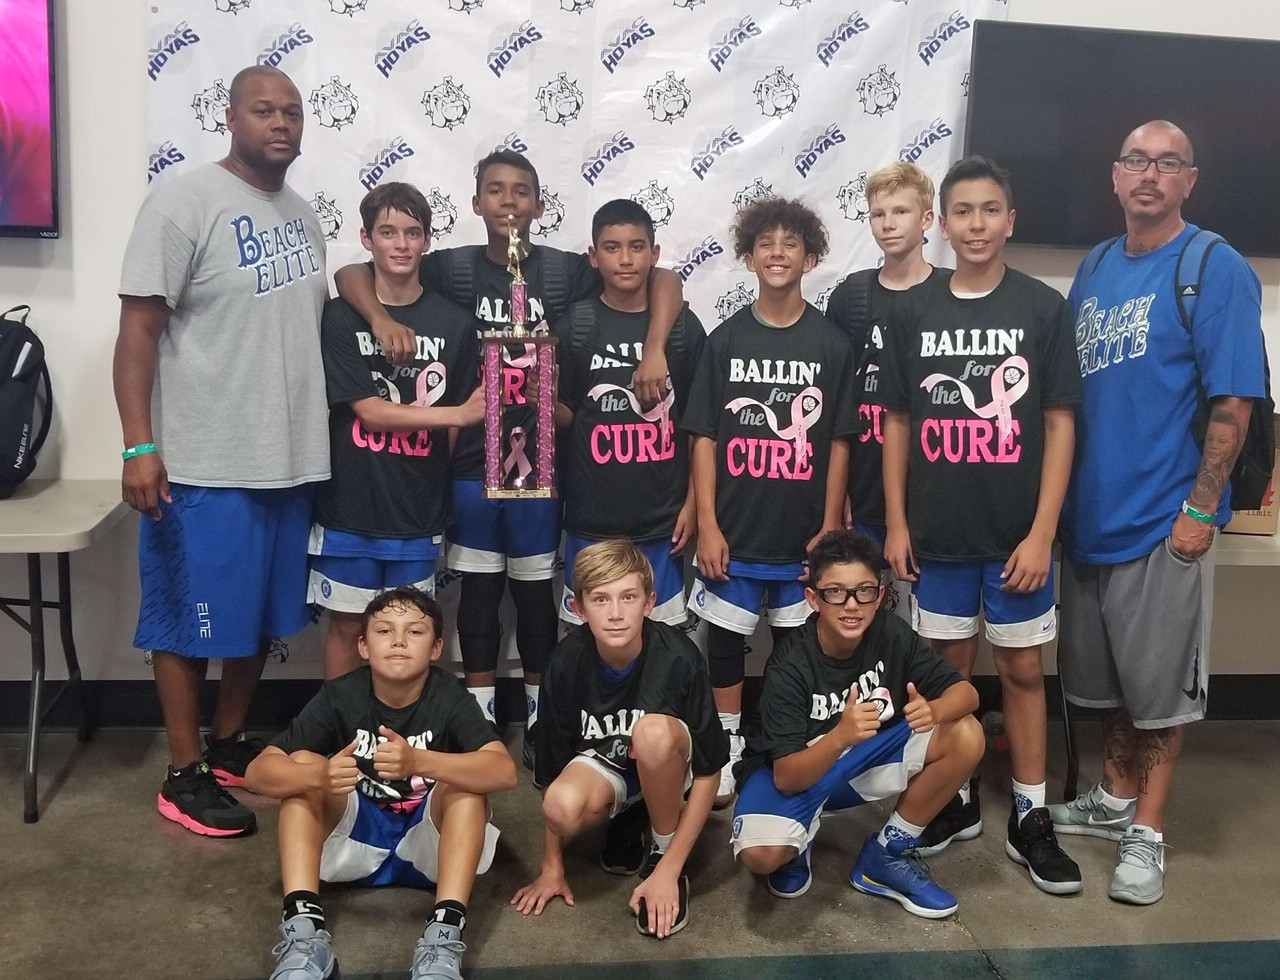 Boys 13U Champions Ballin' for a Cure Ja